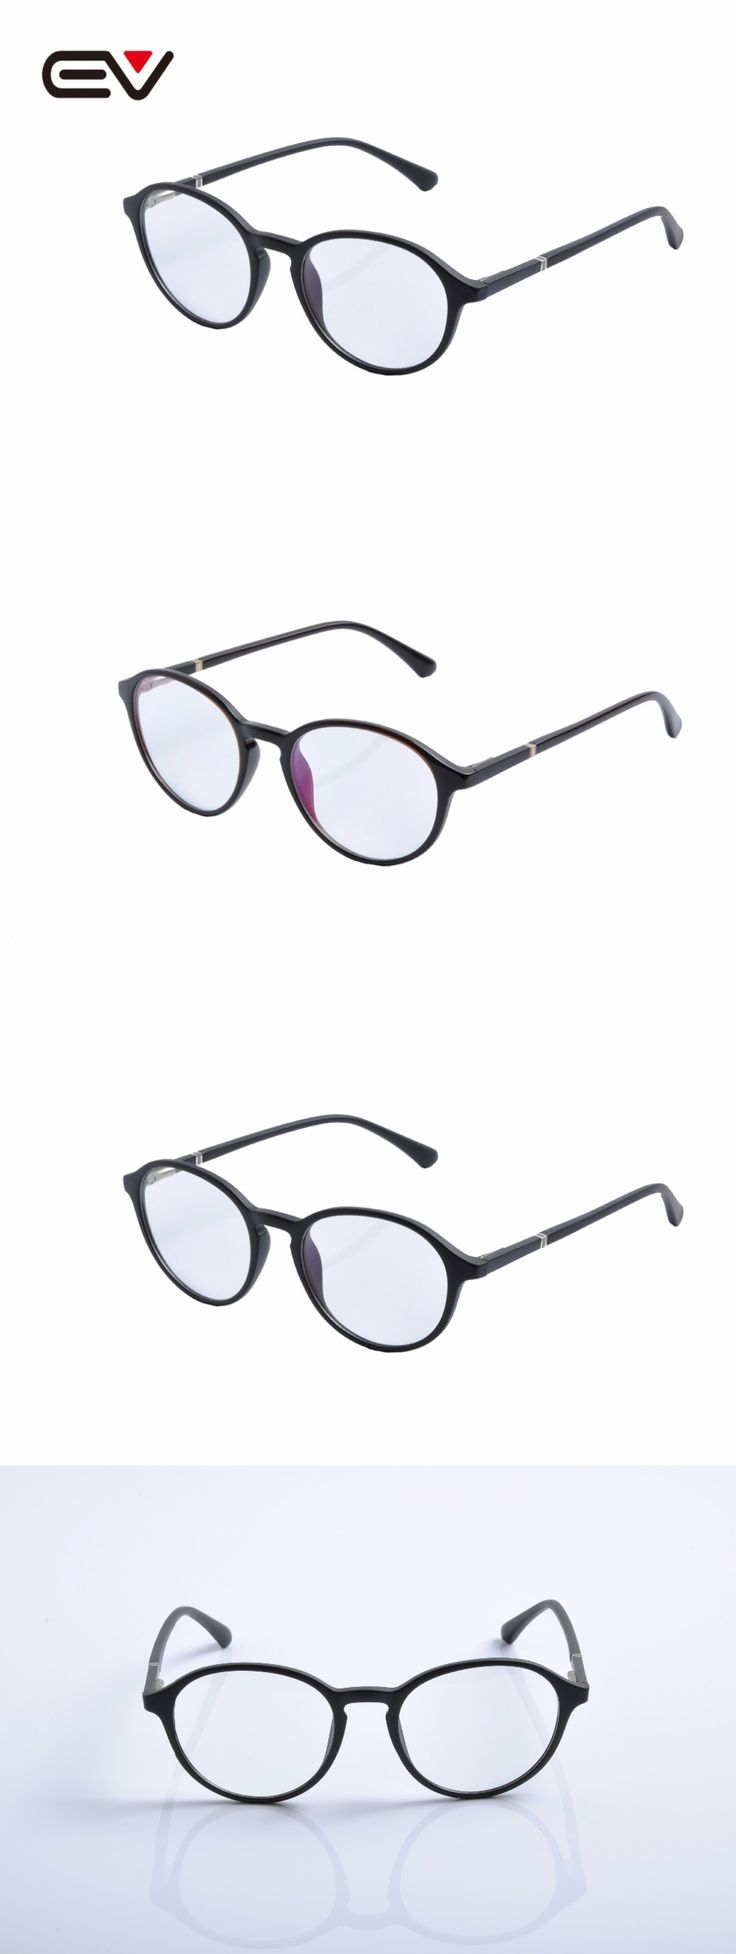 EV Round TR90 Frame Glasses Eye Glasses Frames For Women Eyeglass Frame Eyewear Eyeglasses Frames Men  Monturas De Gafas EV1436